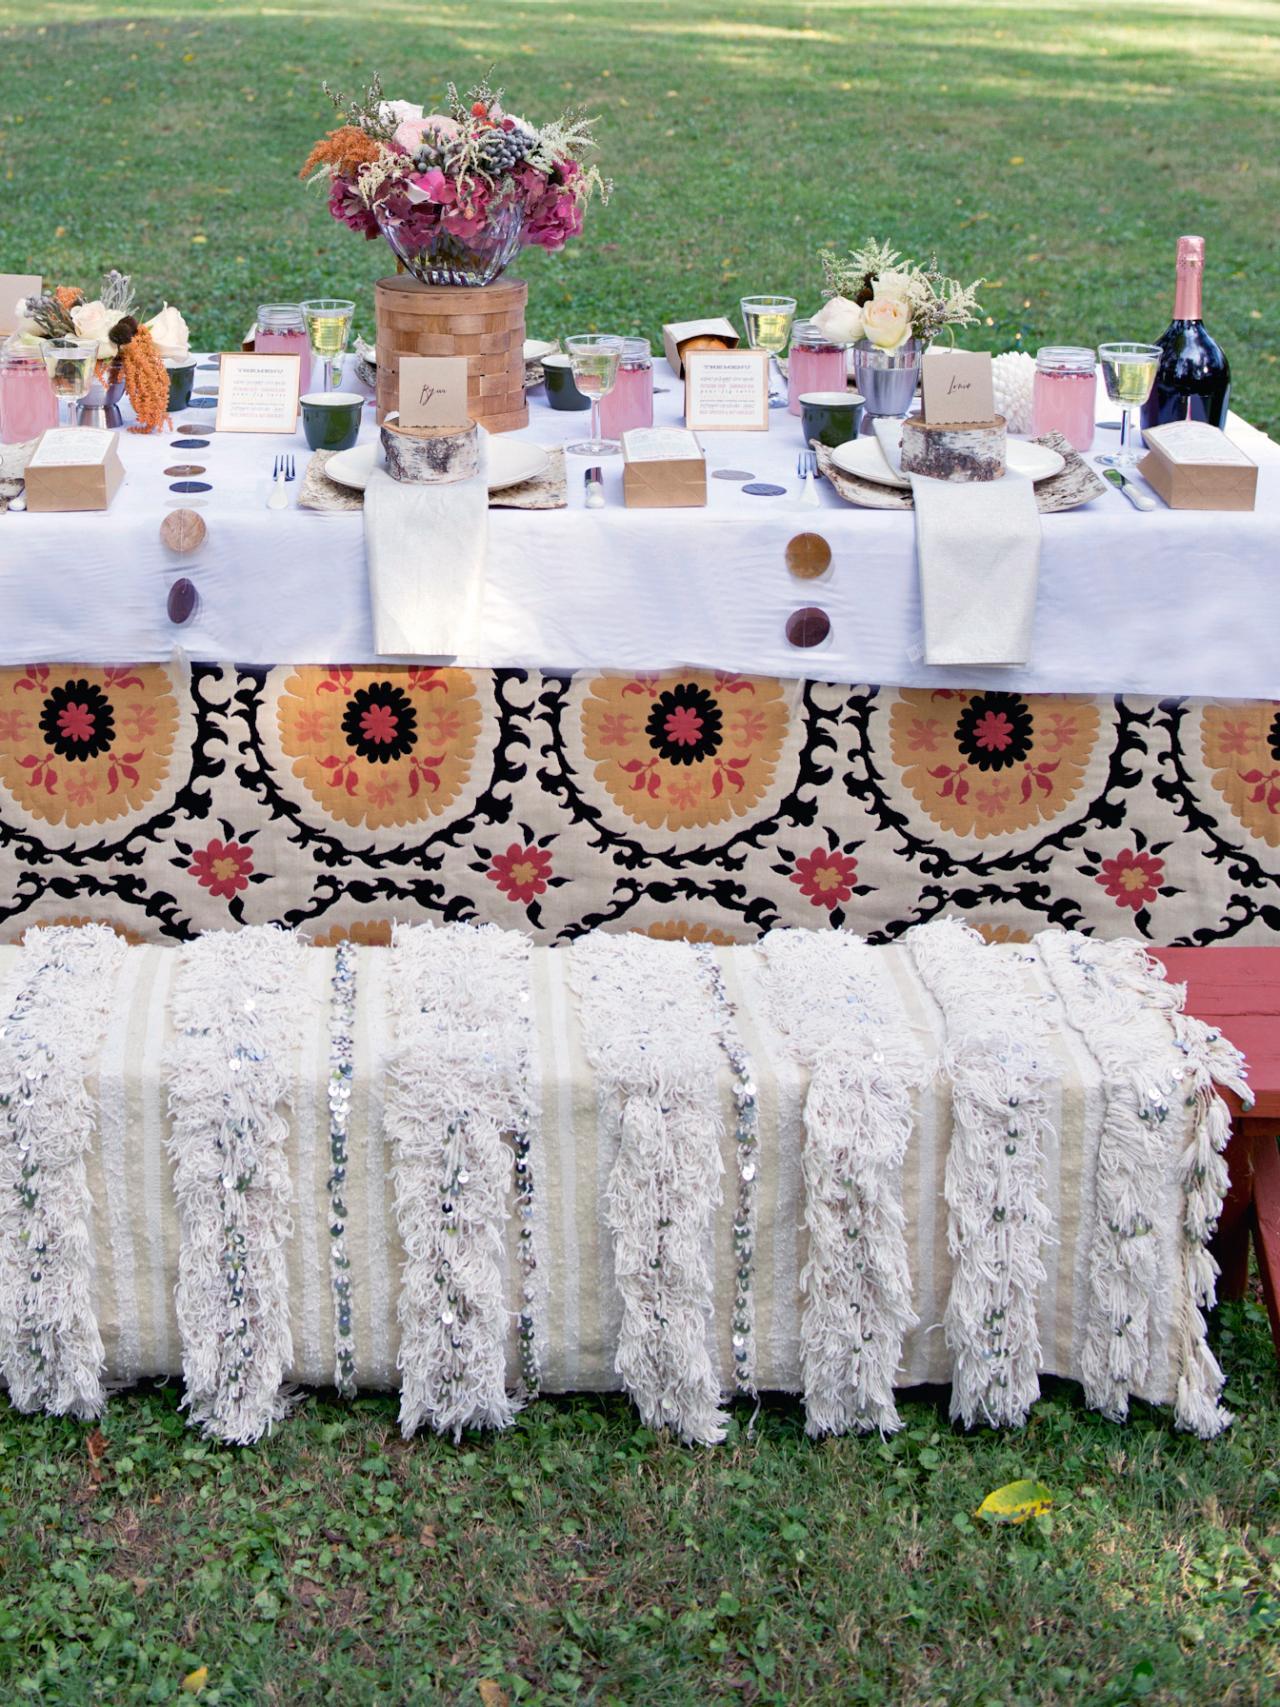 Picnic Table Bench Covers Part   36: Original_Manvi Drona Hidalgo Winter